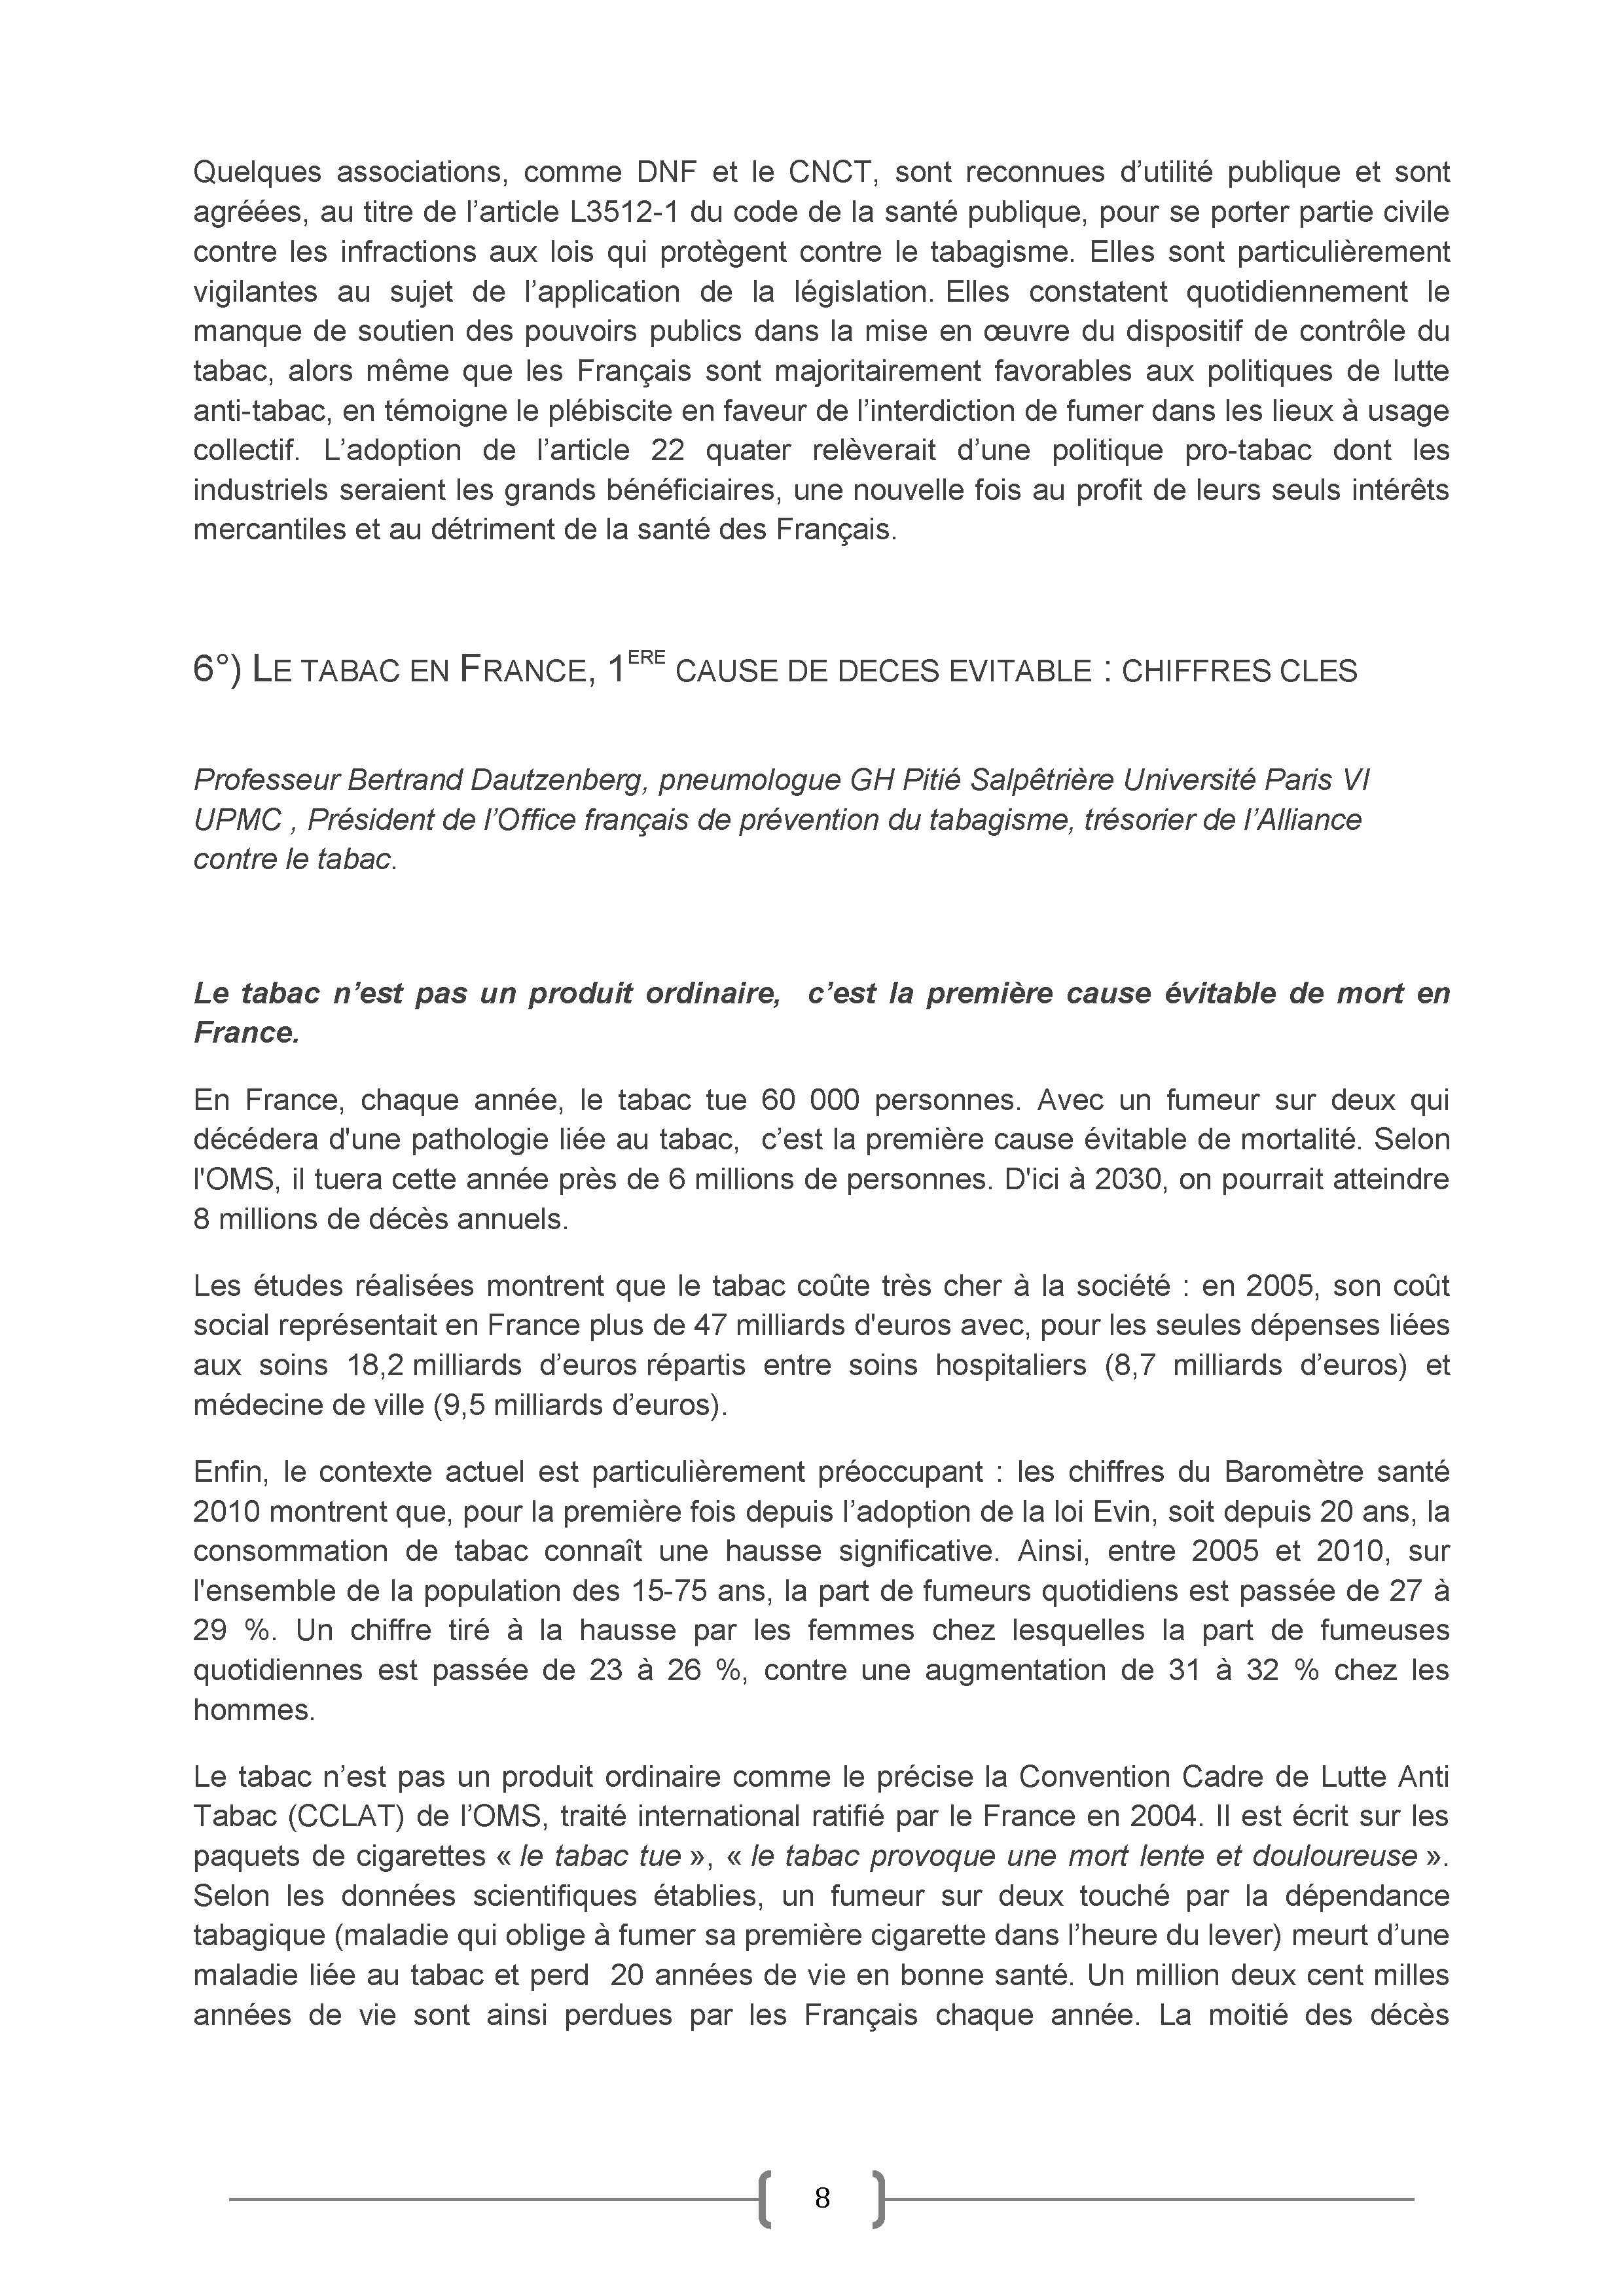 Alliance-DP_projet-loi-article-22-quater_05juil2011_Page_8.jpg